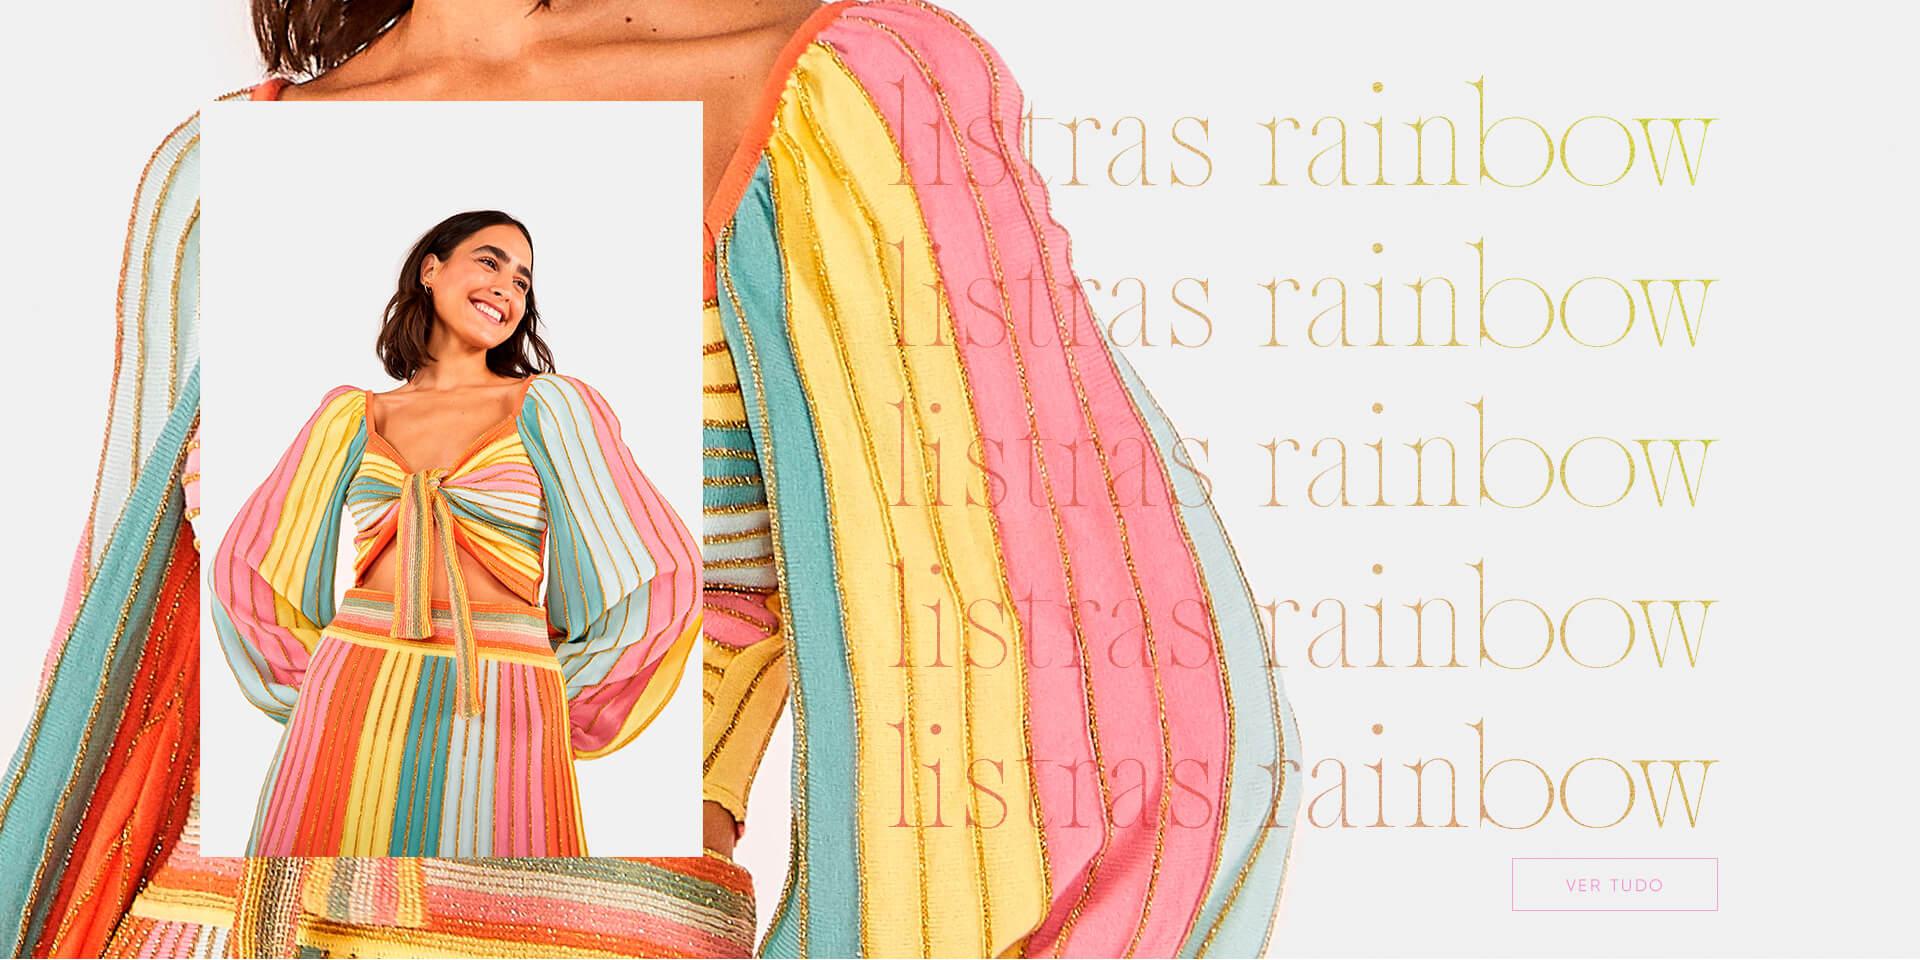 BANNER listras rainbow 17-11